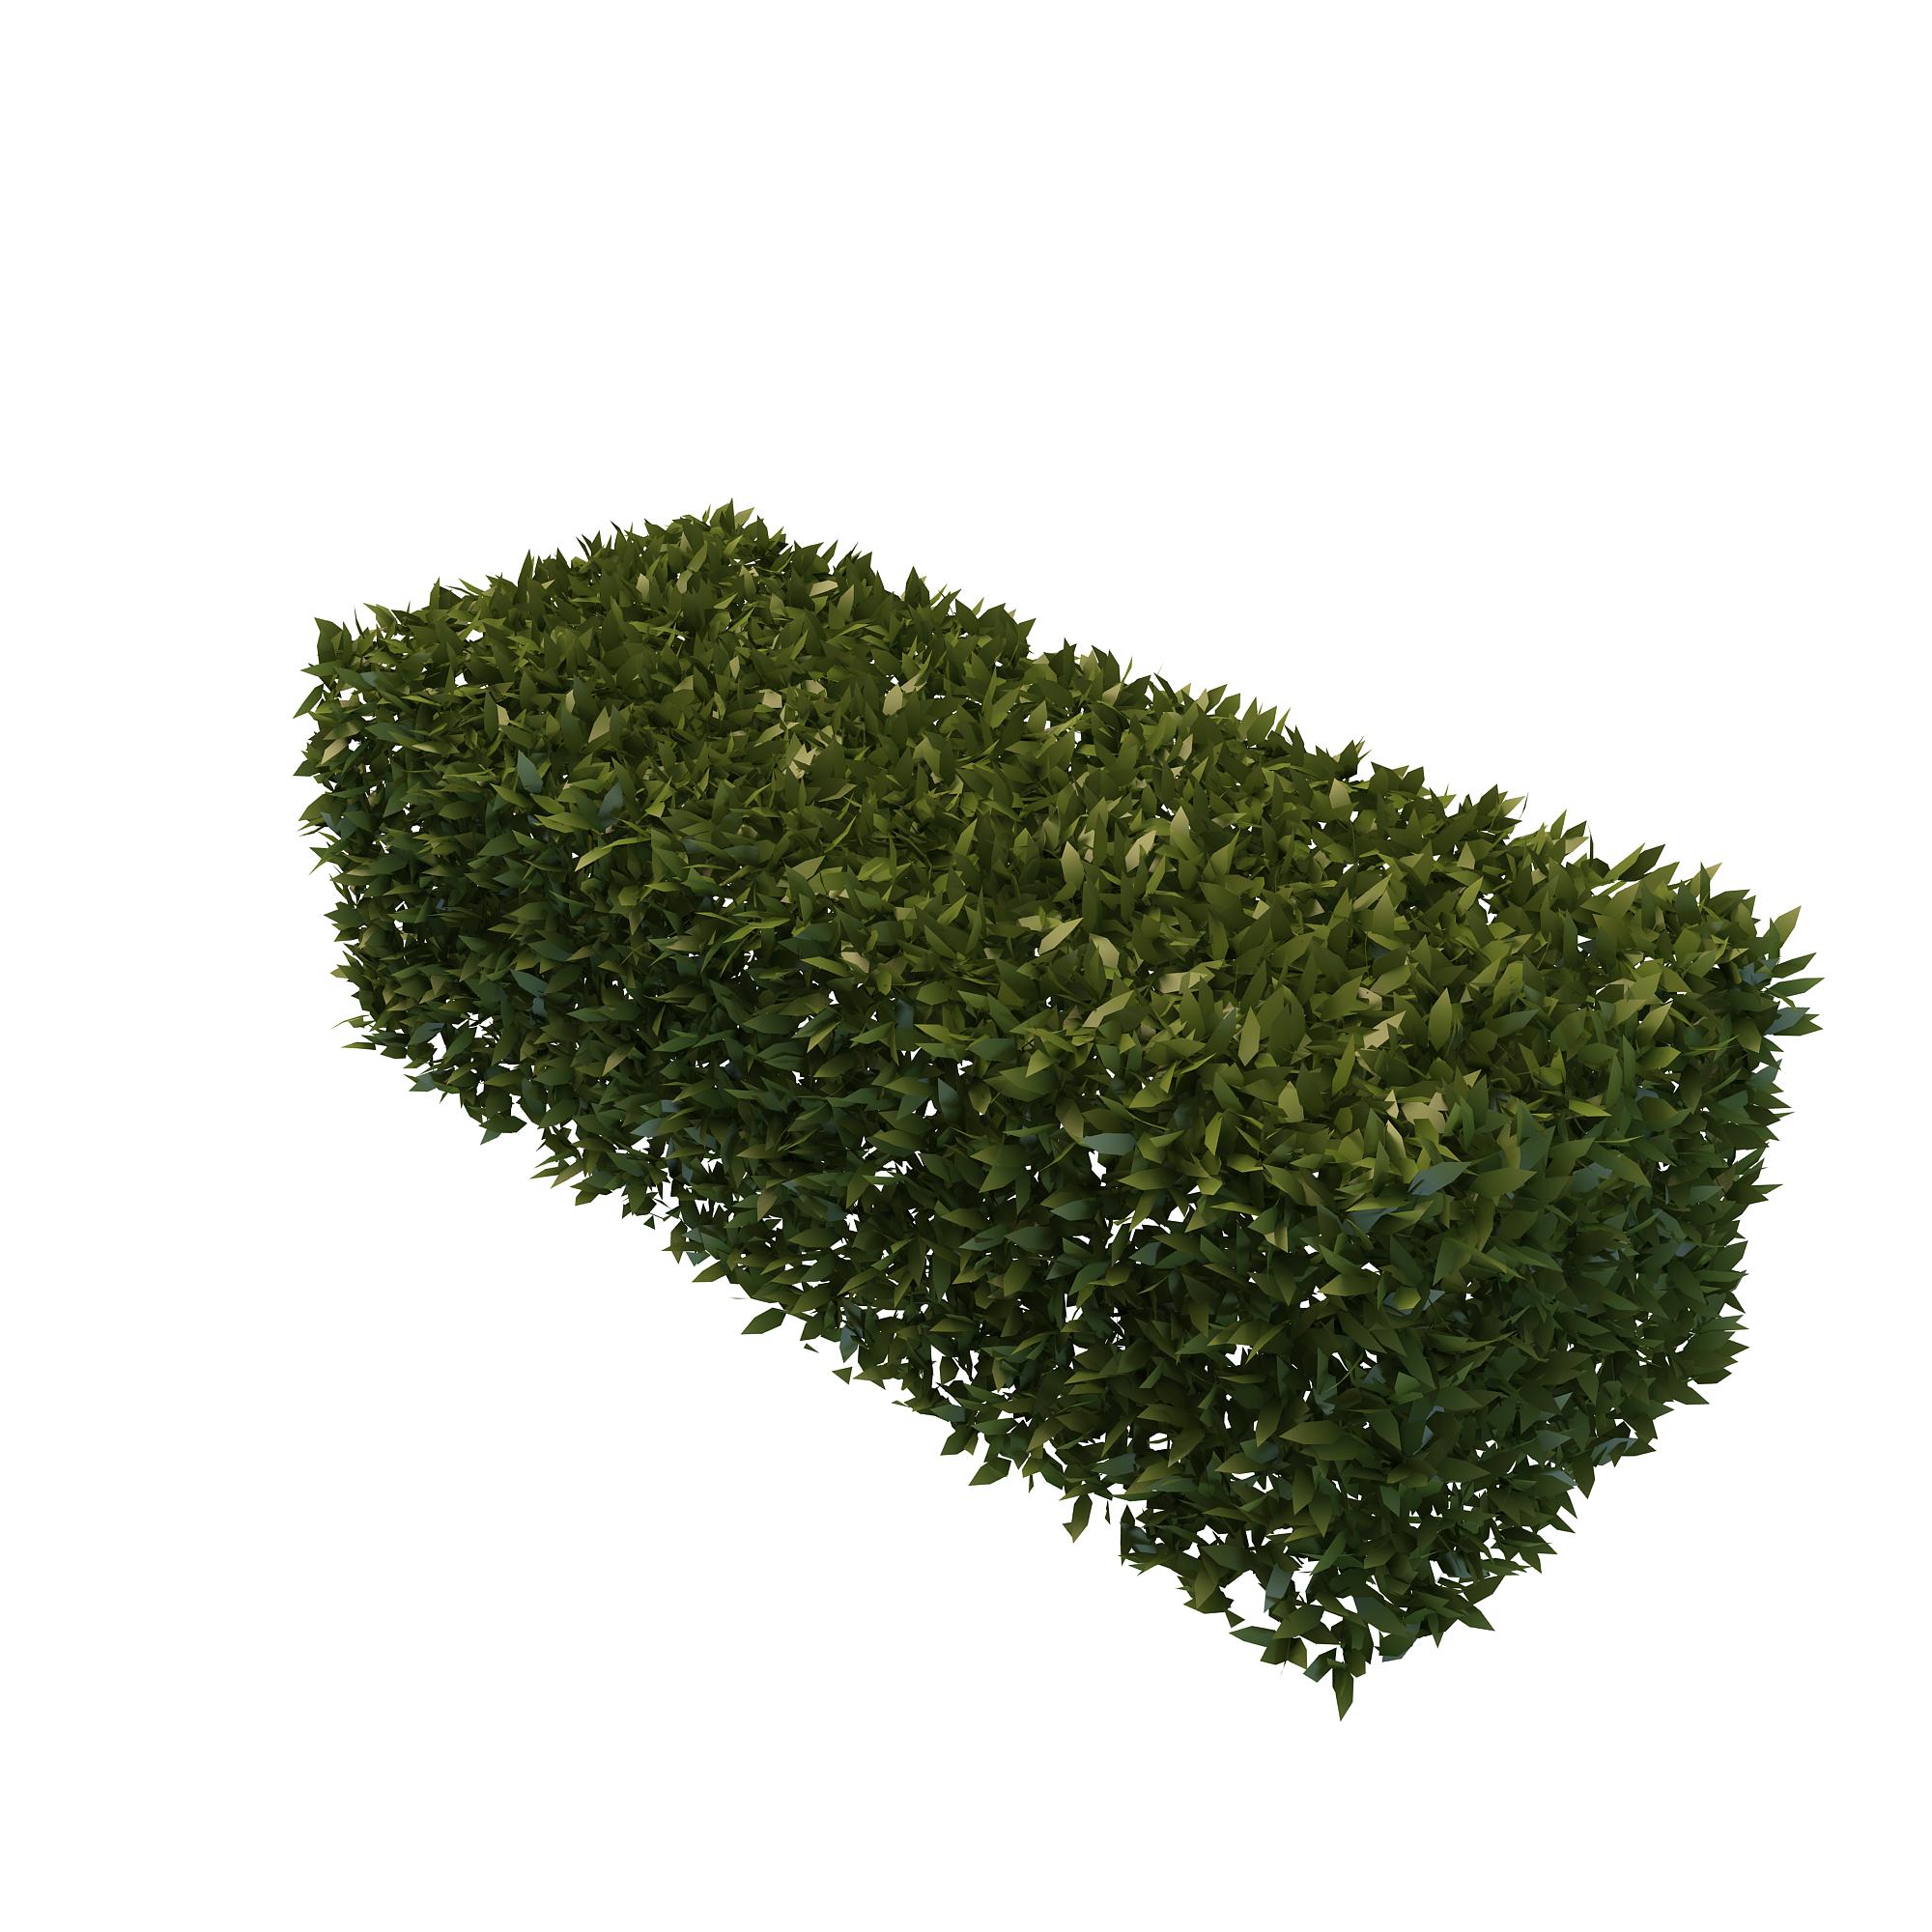 Best Free Hedges Png Image #32440.